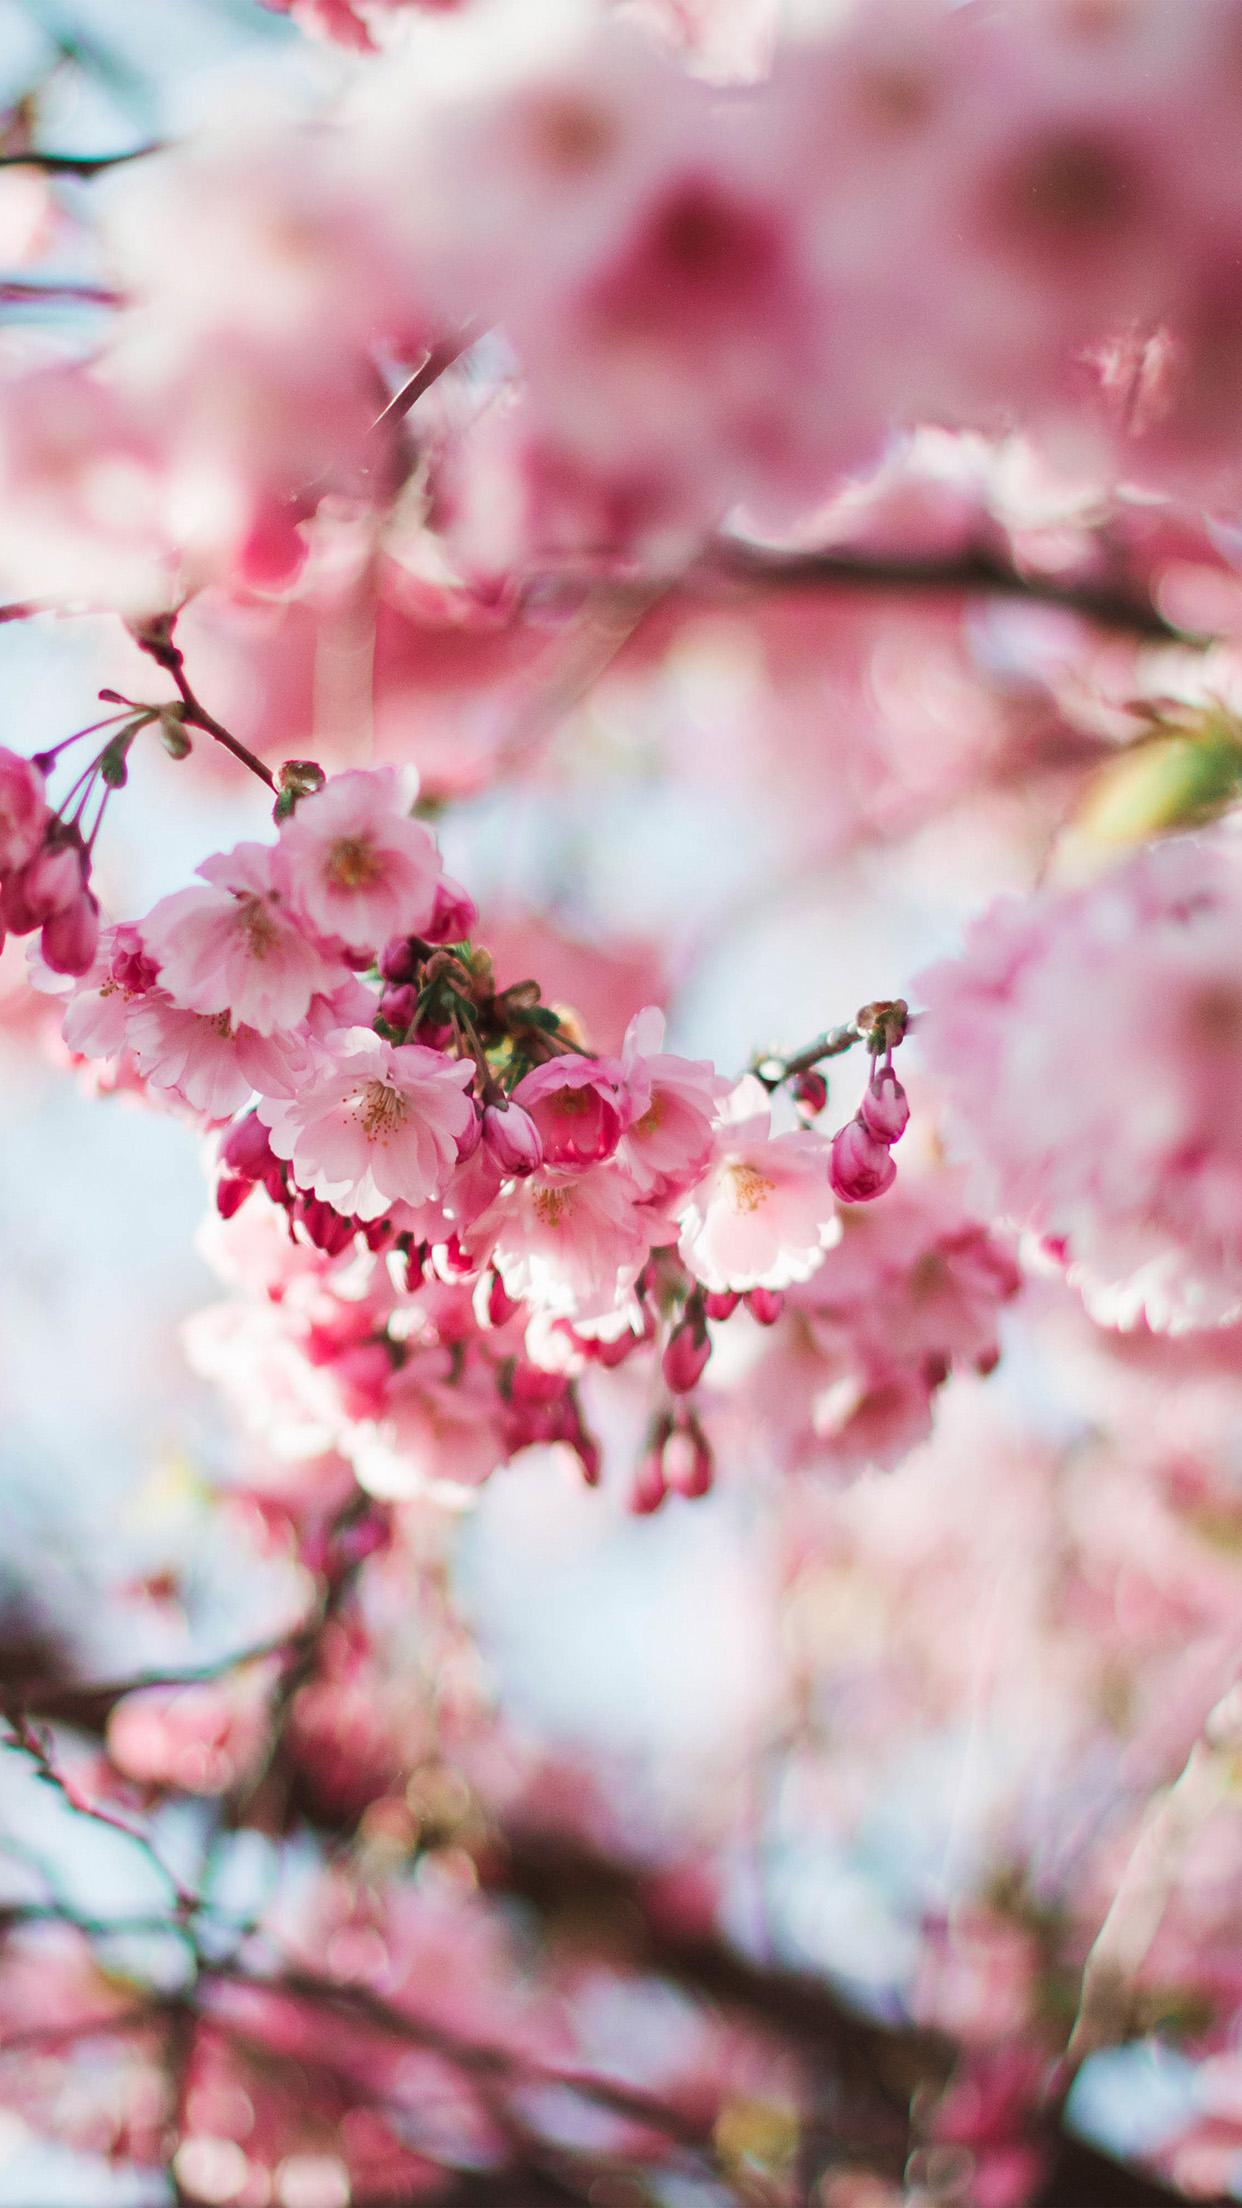 Iphone 5 Hd Wallpaper Retina Nx72 Spring Cherry Blossom Tree Flower Pink Nature Wallpaper